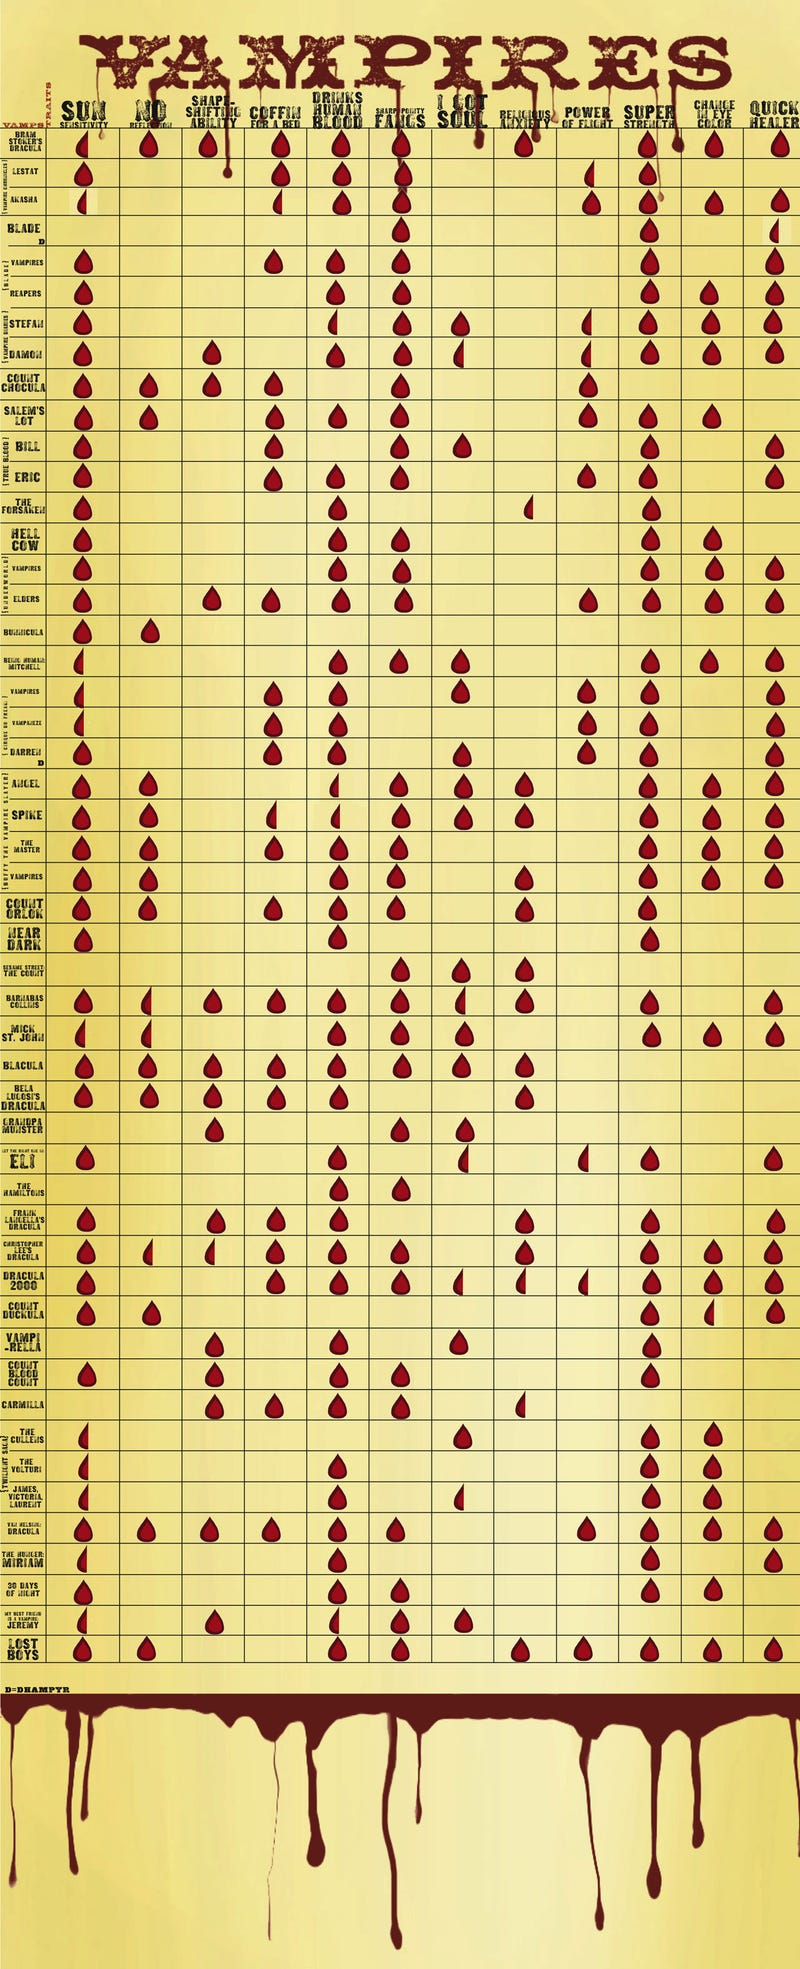 Top 50 Vampires: The Ultimate Score Sheet